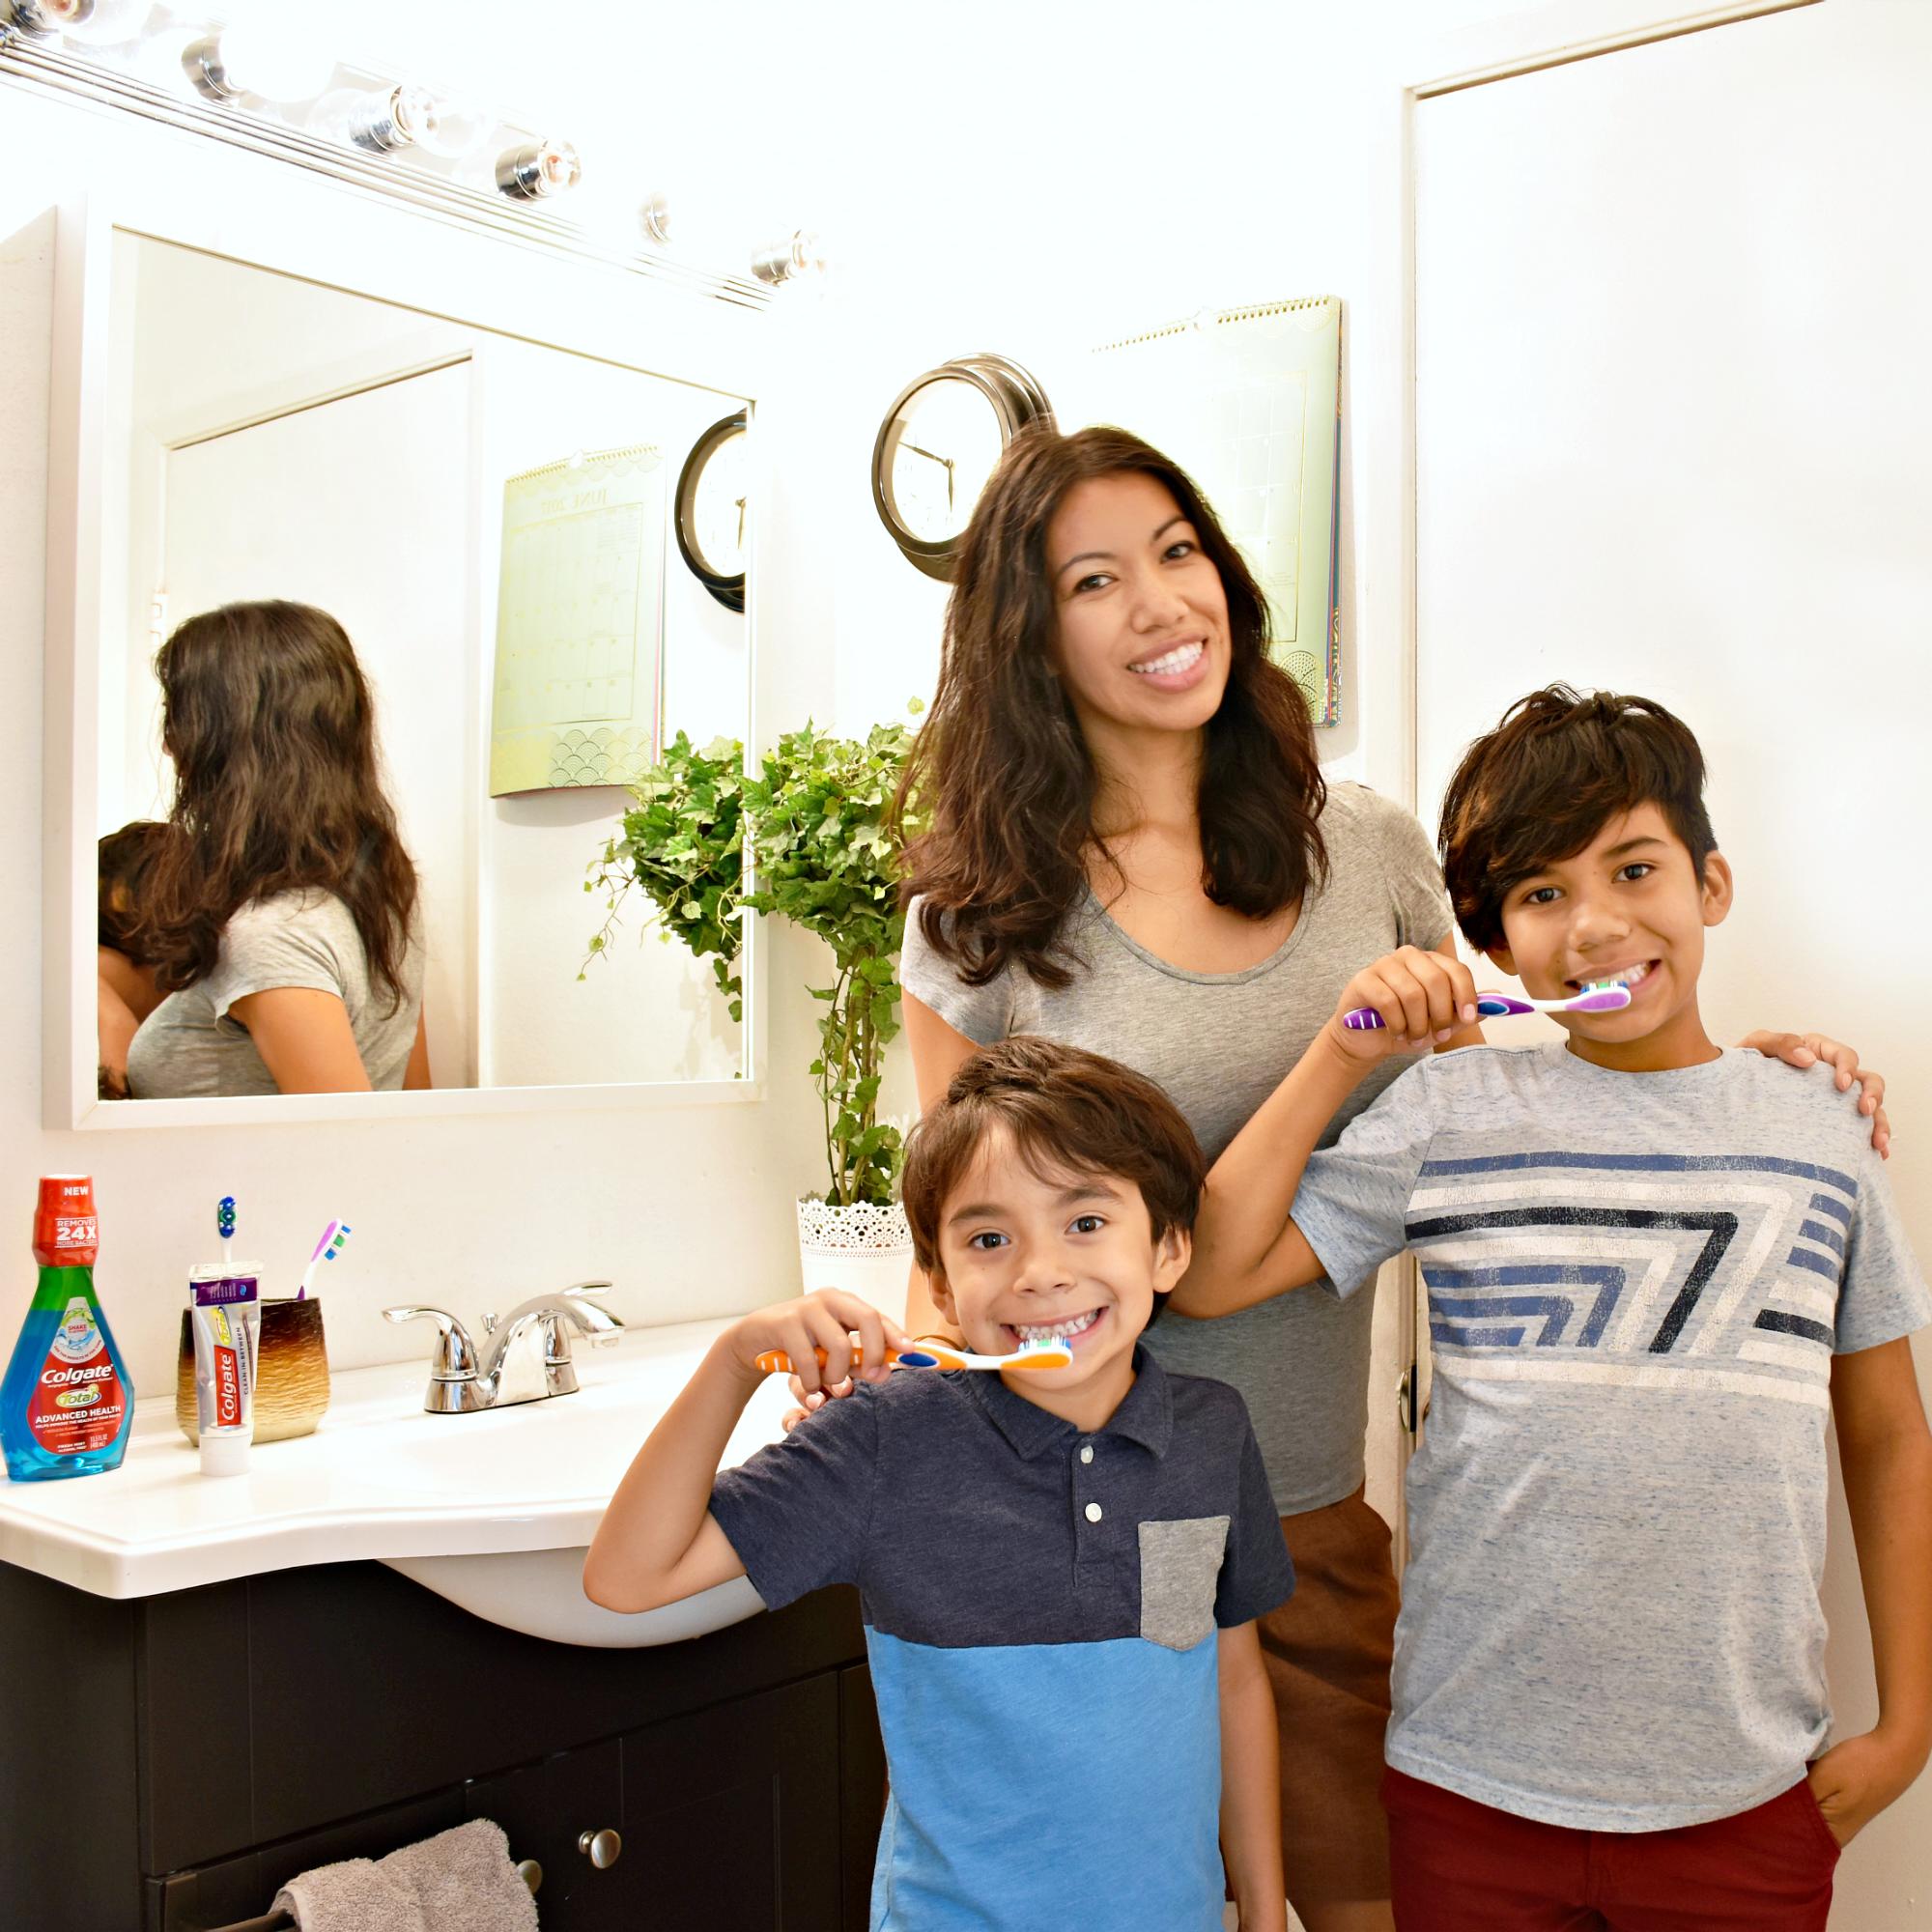 Pattie Cordova and chiclets celebrating Colgate's Oral Health Month - LivingMiVidaLoca.com